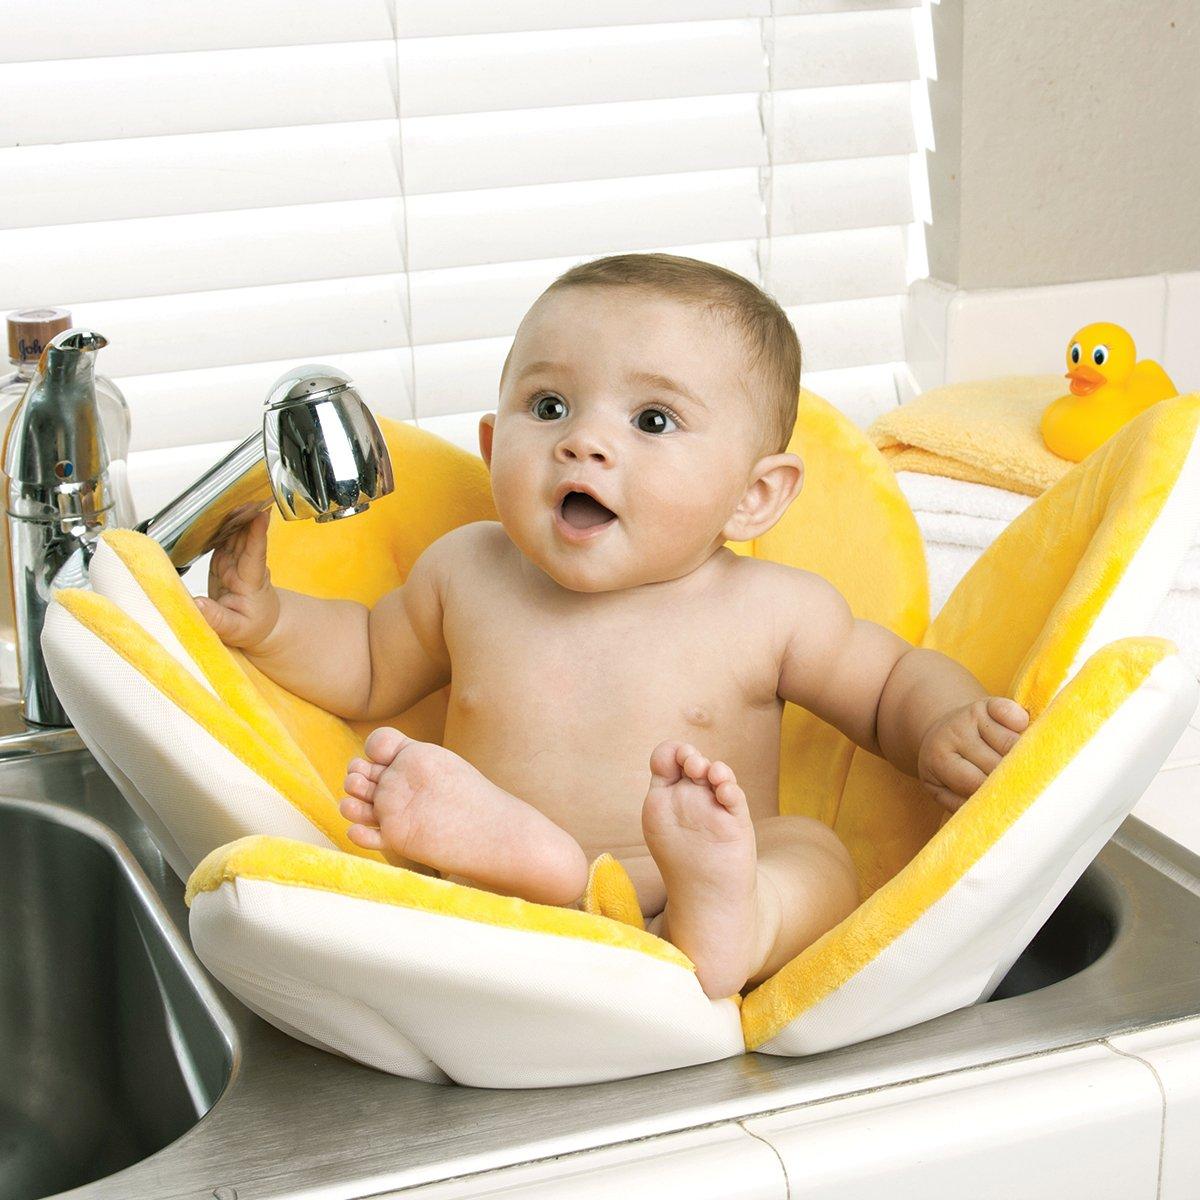 Blooming Bath Baby Tub: Best Baby Bathtub for Kitchen Sink